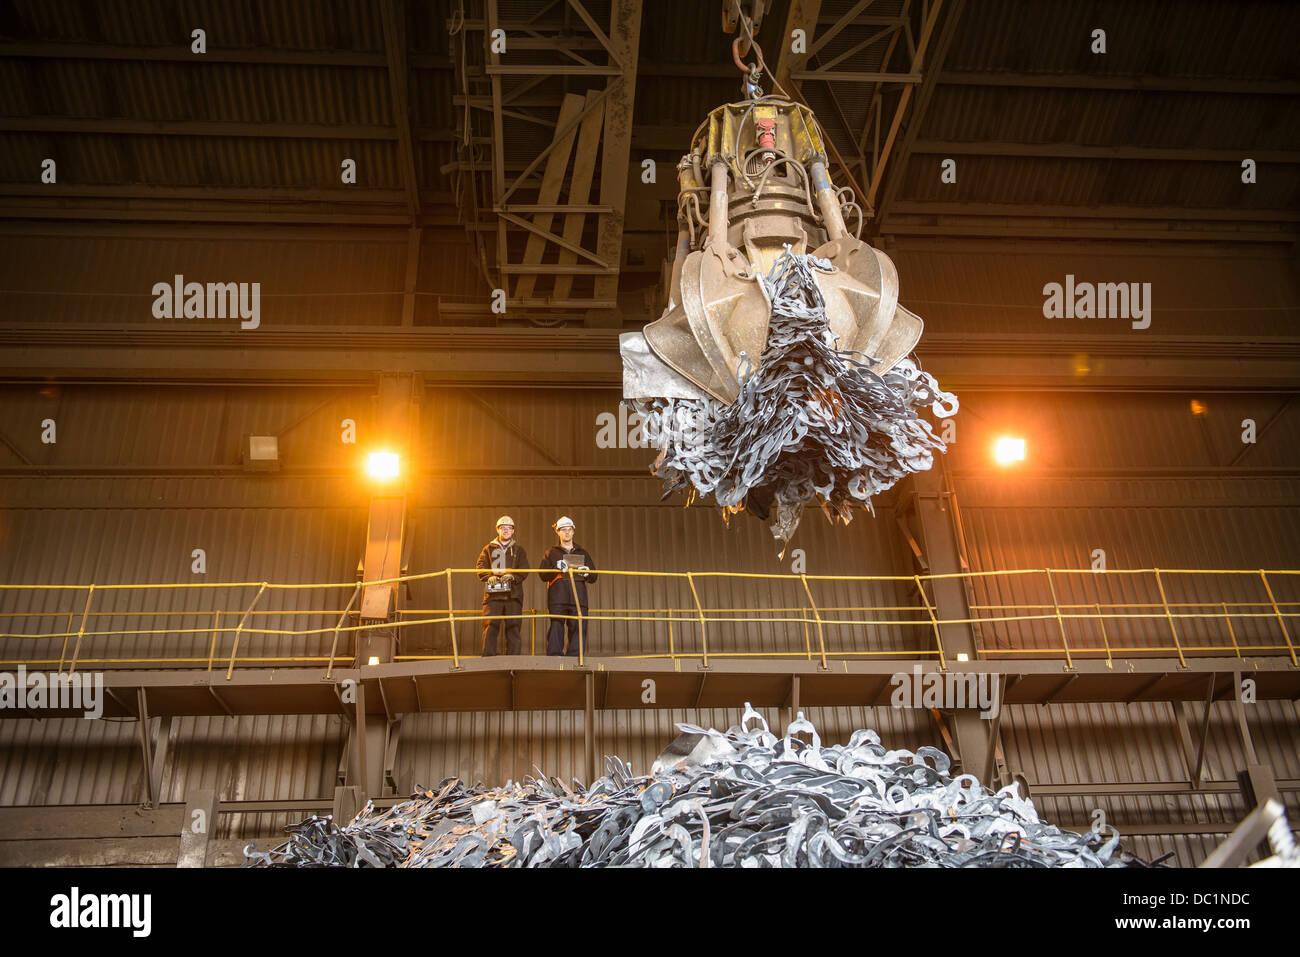 Steel workers watching mechanical grabber in steel foundry Stock Foto